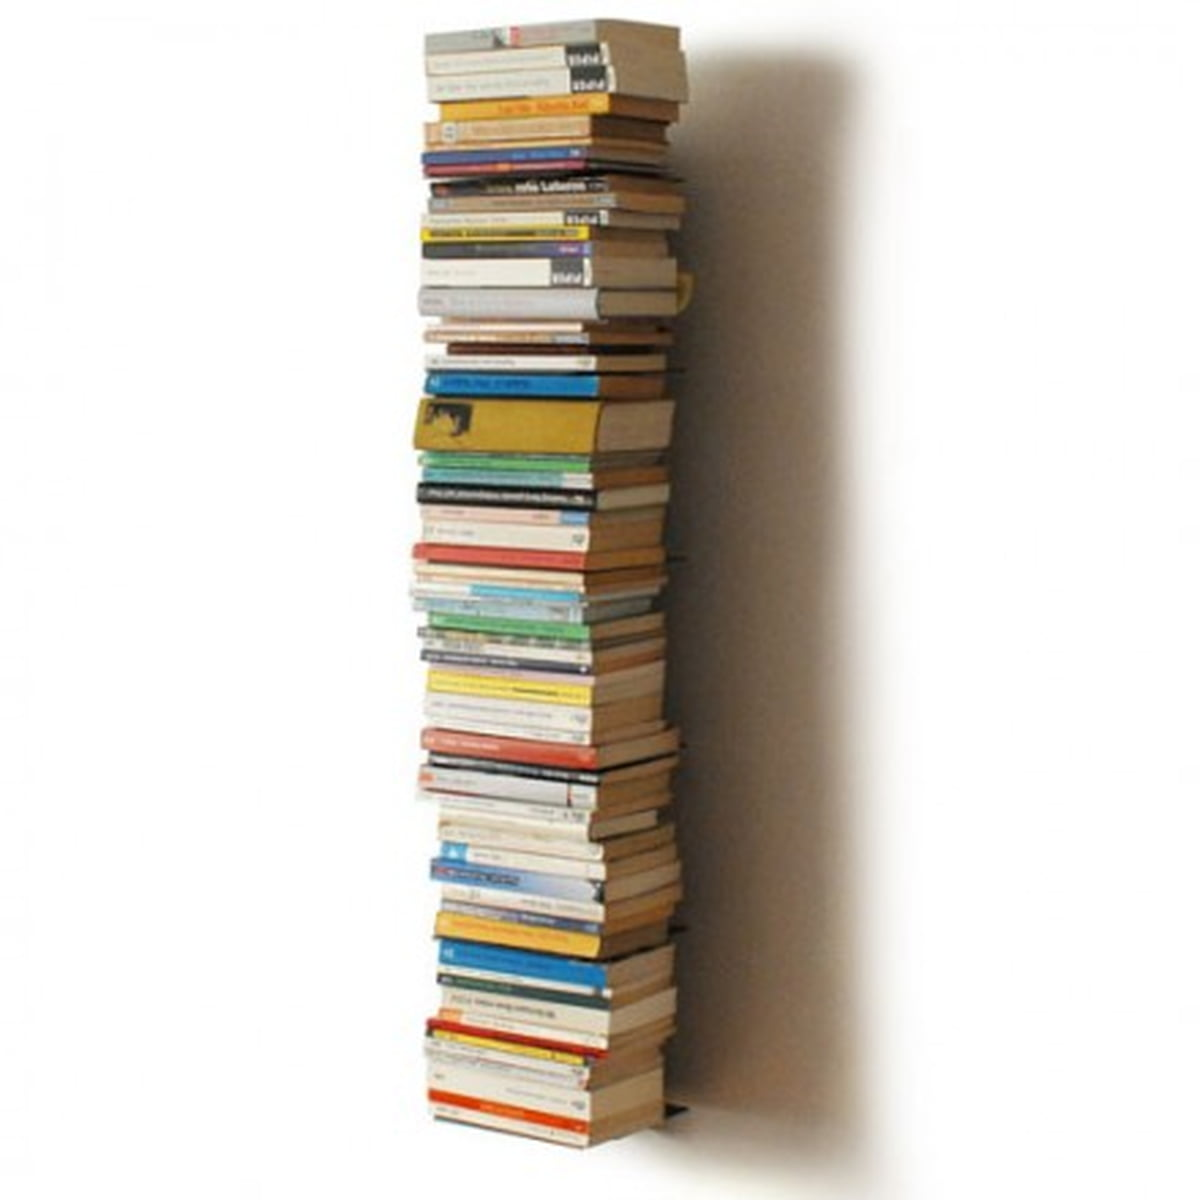 tour de livres haseform shop. Black Bedroom Furniture Sets. Home Design Ideas